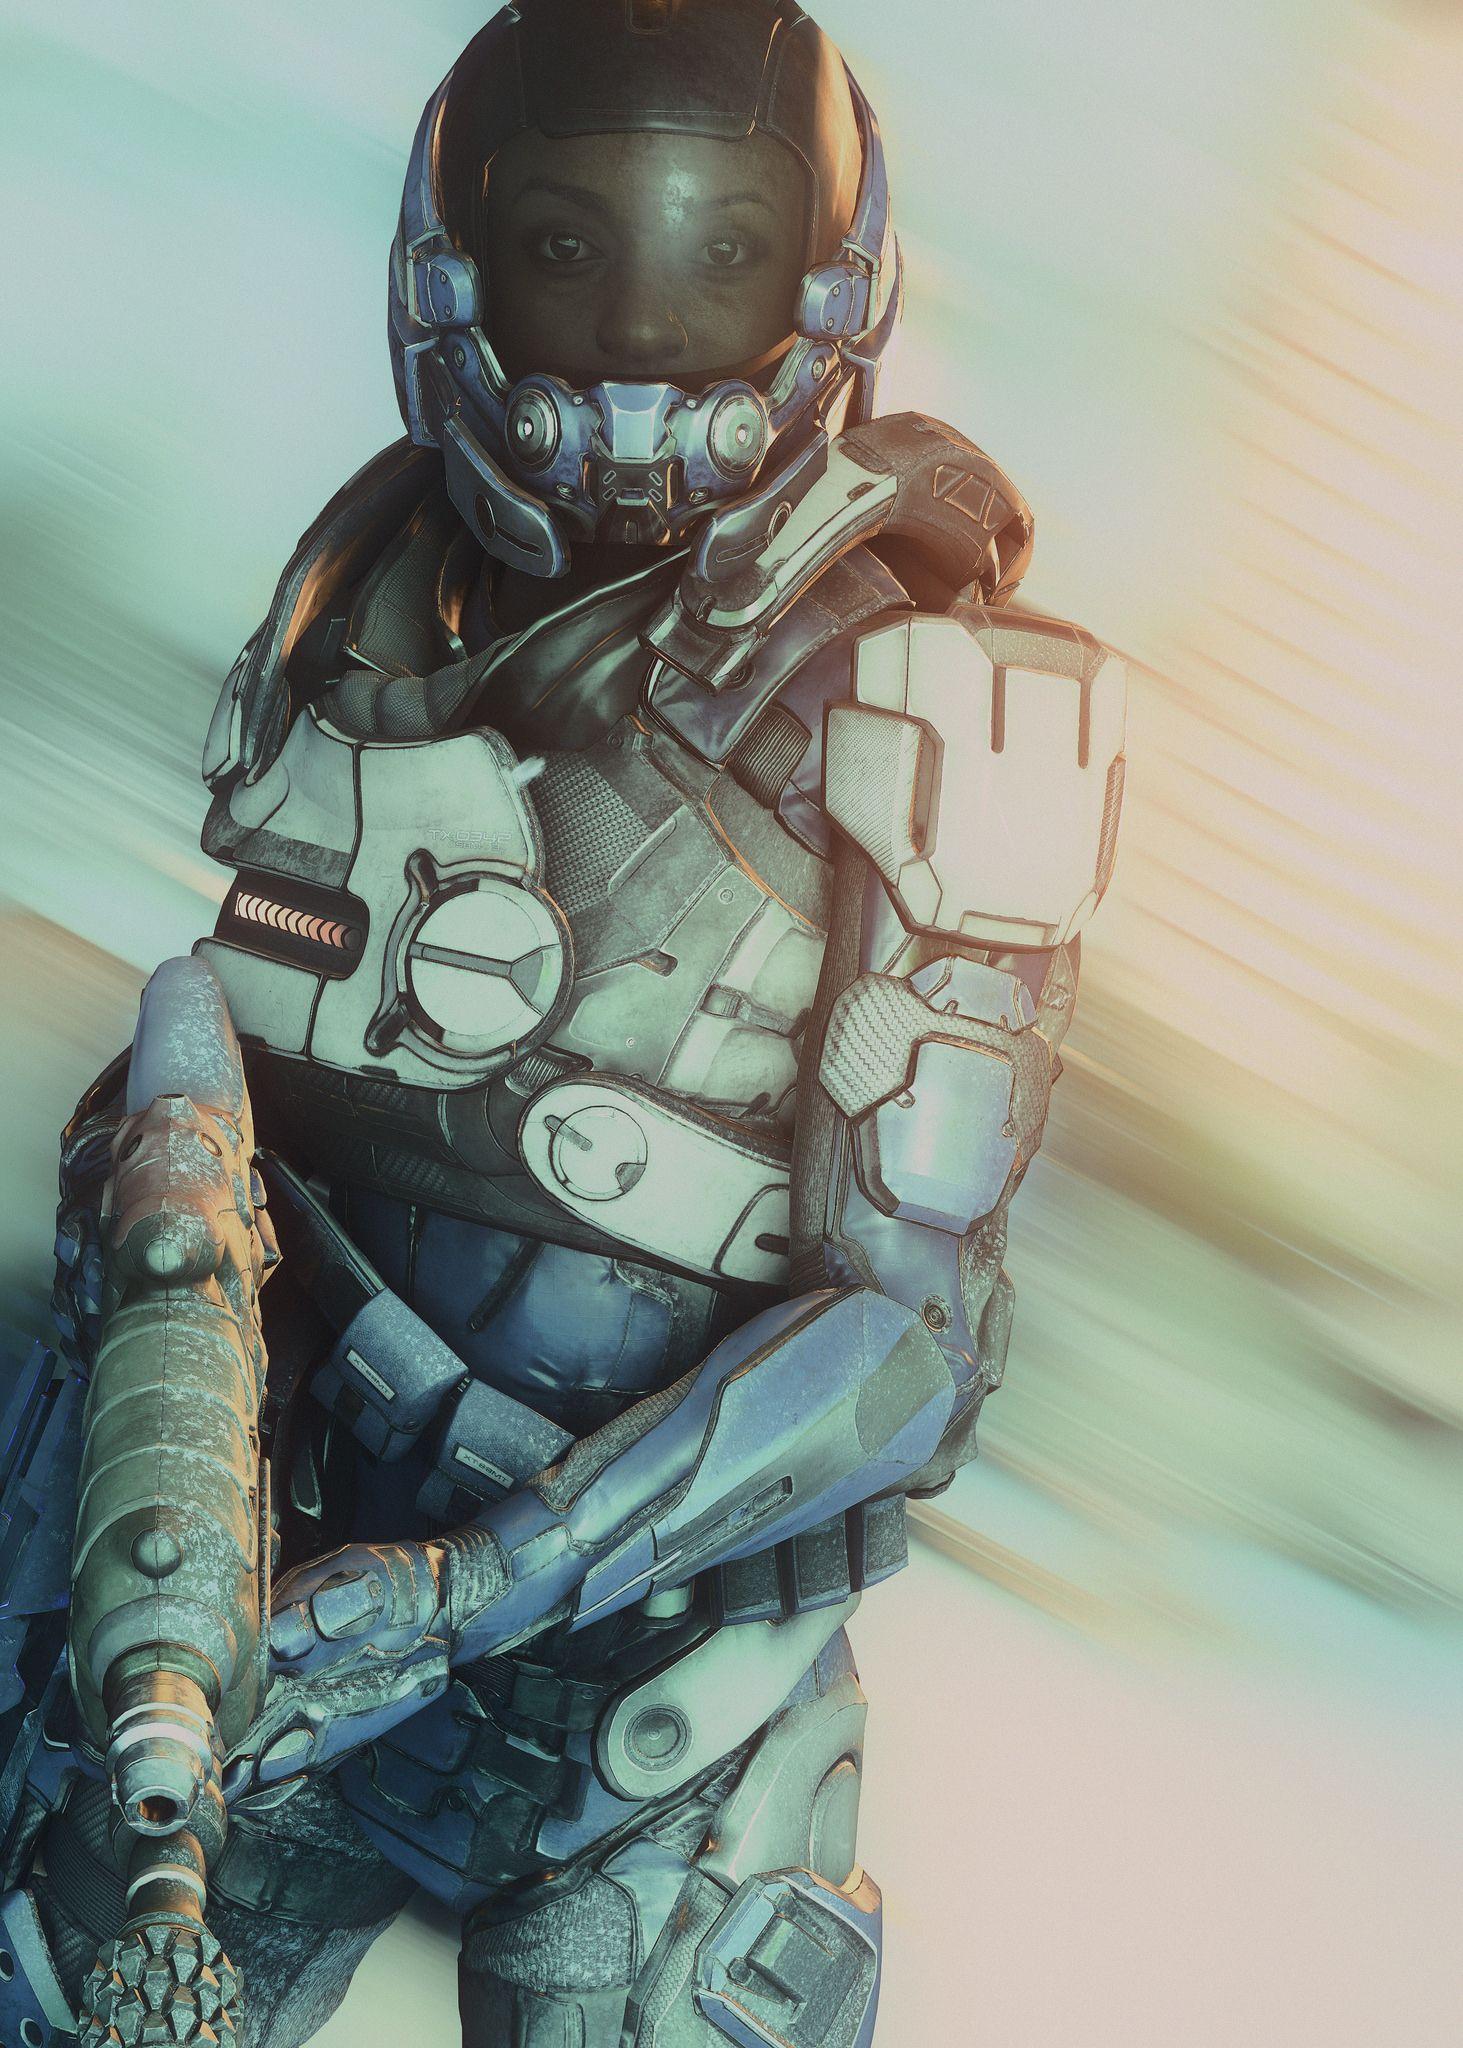 Cyberpunk Concept Art Sci Fi Soldier